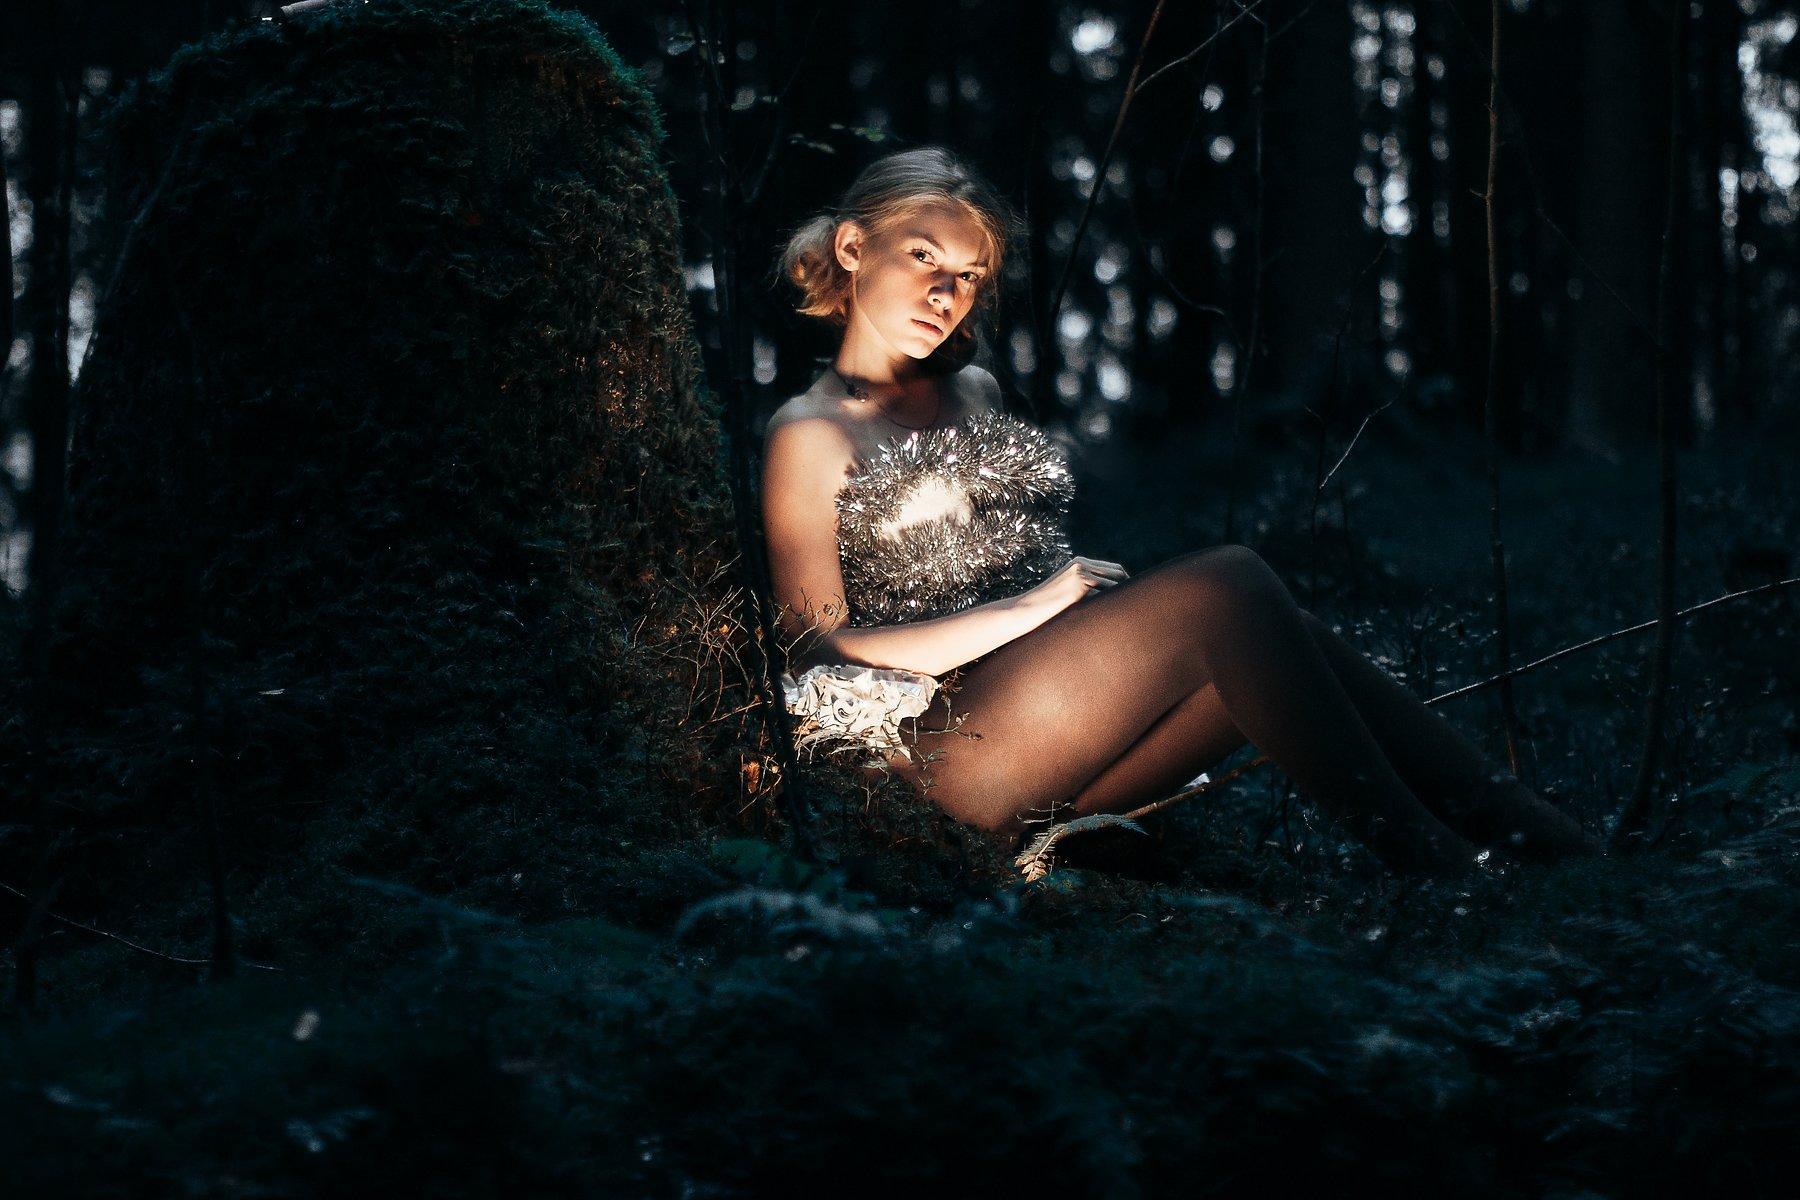 портрет, девушка, сумерки, гламур, атмосфера, лес, свет, Олег Карсаков